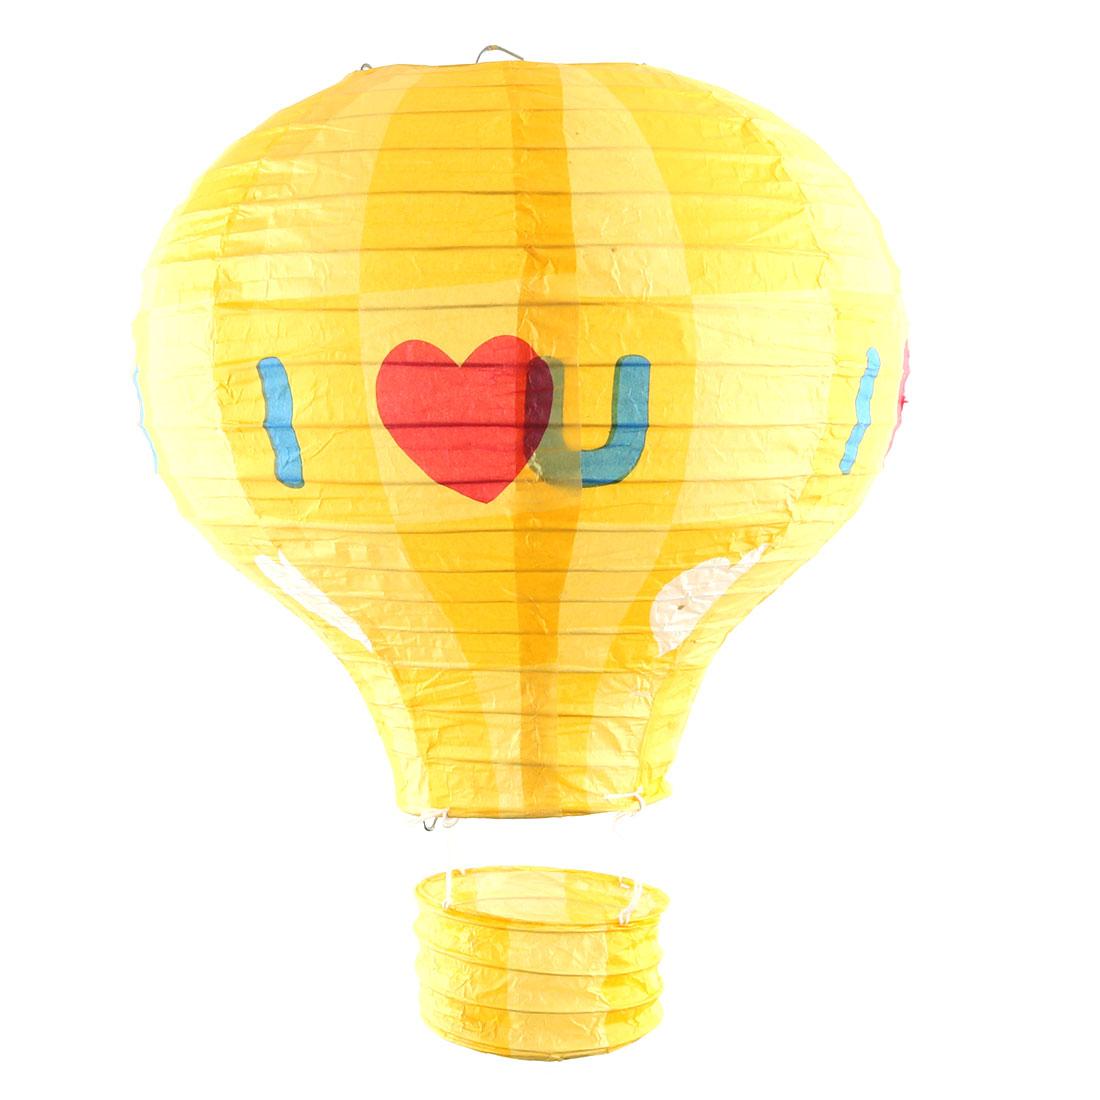 Engagement Feast Paper Heart Pattern DIY Lightless Hanging Decor Hot Air Balloon Lantern Yellow 10 Inches Dia